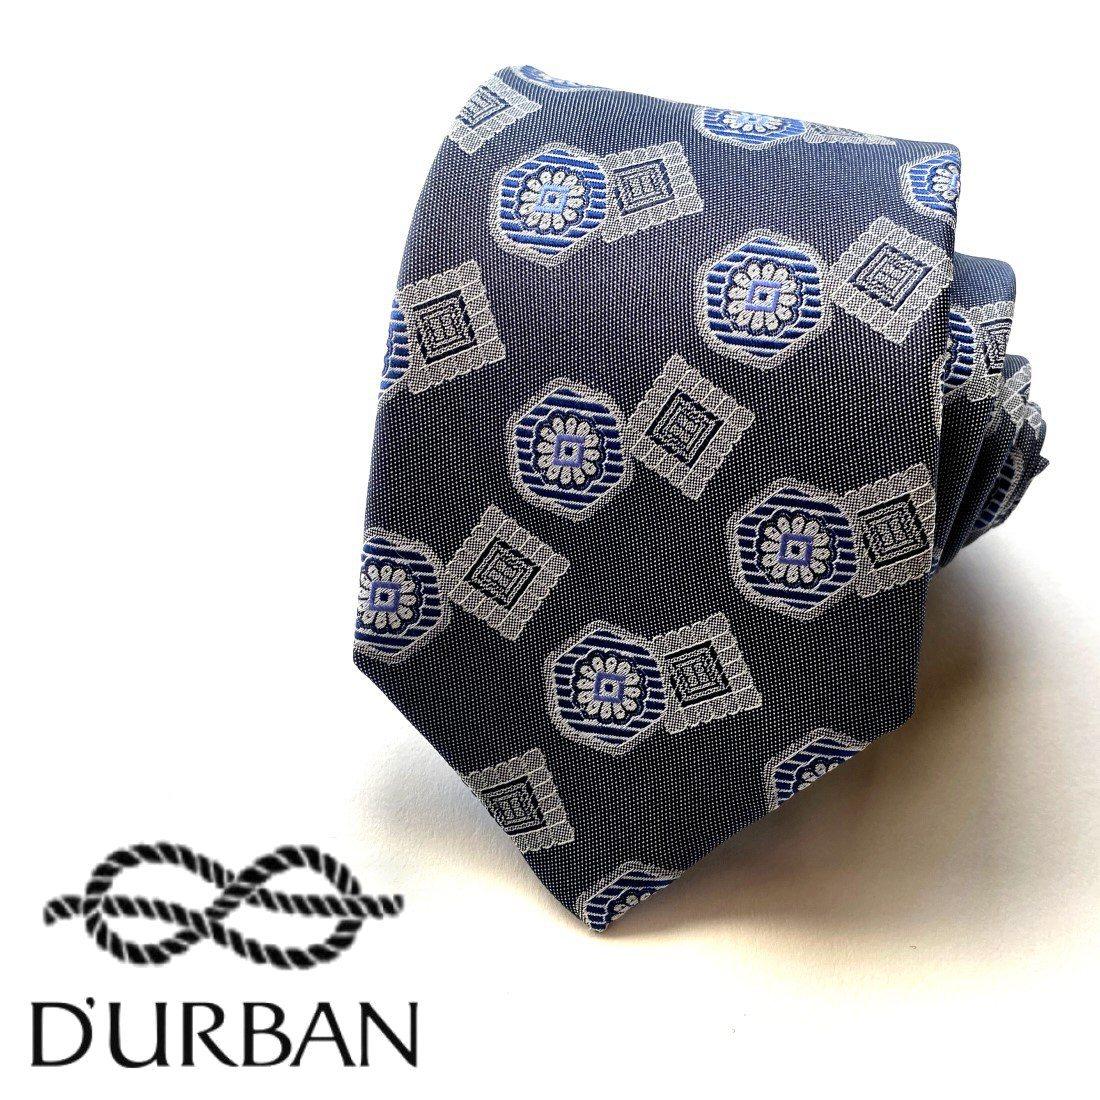 MADE IN JAPAN 売り出し D'URBAN ダーバン 店舗 日本製シルクネクタイ絹100%グレー系